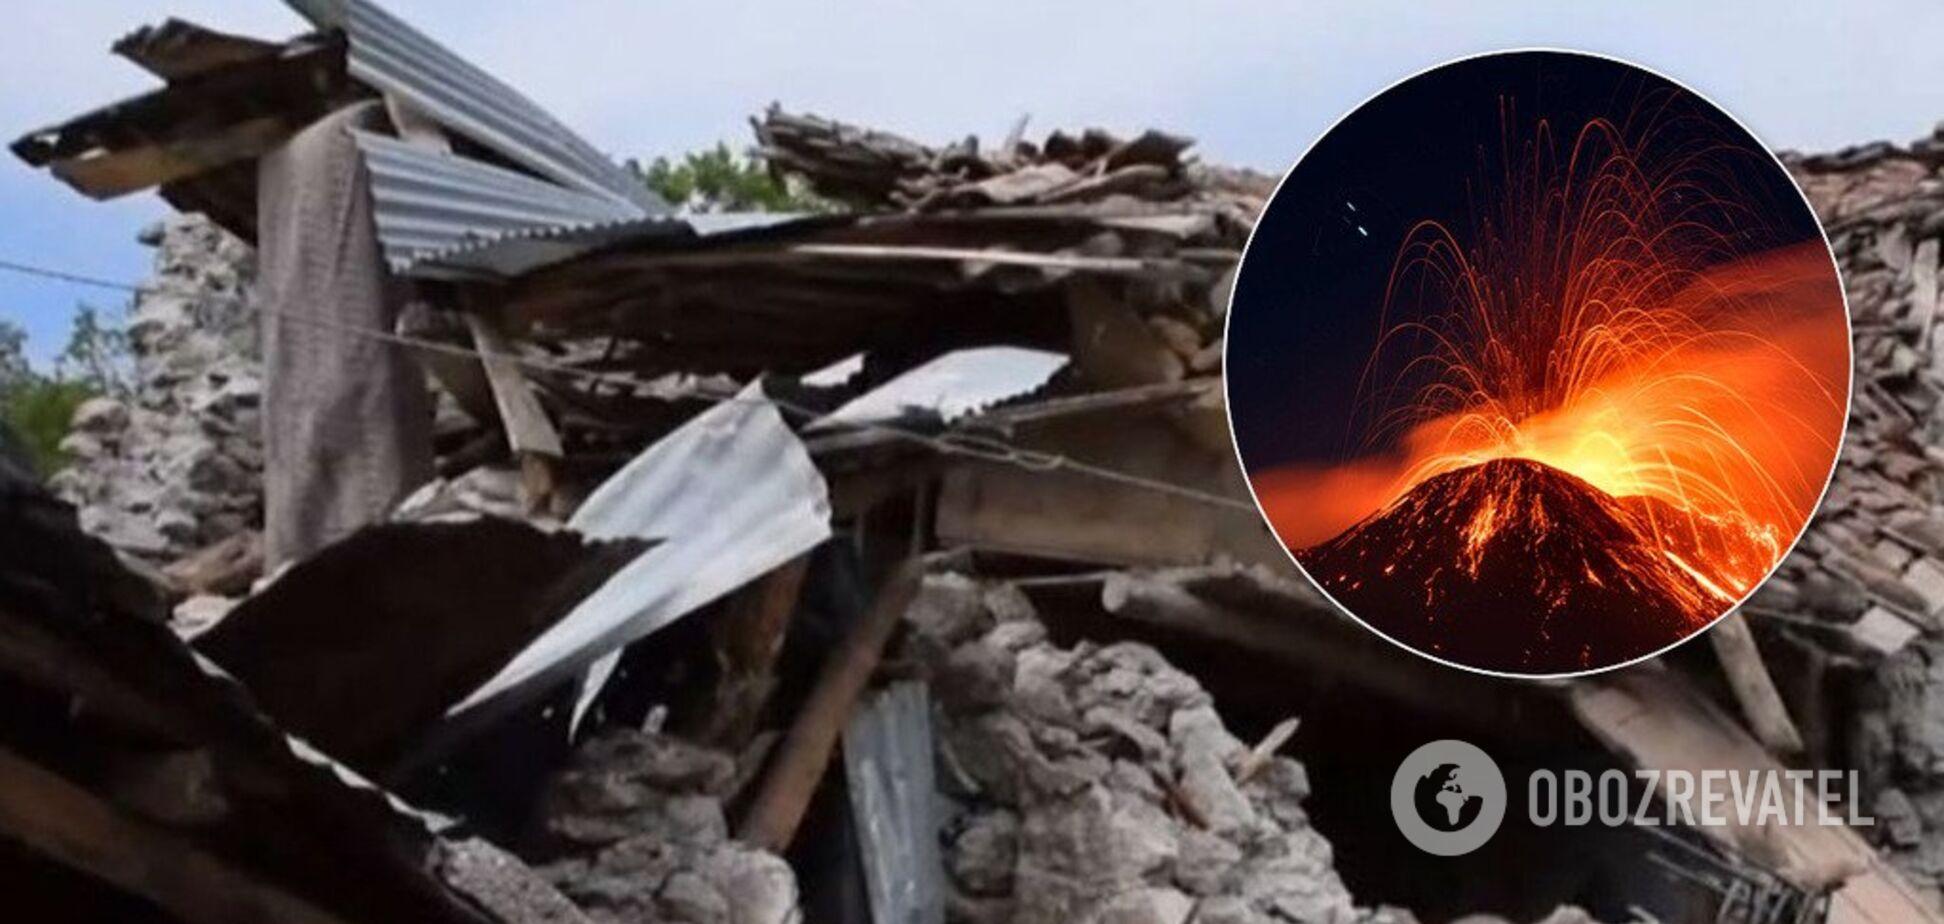 Закарпаттю пригрозили землетрусом: геолог пояснив, чому не варто боятися